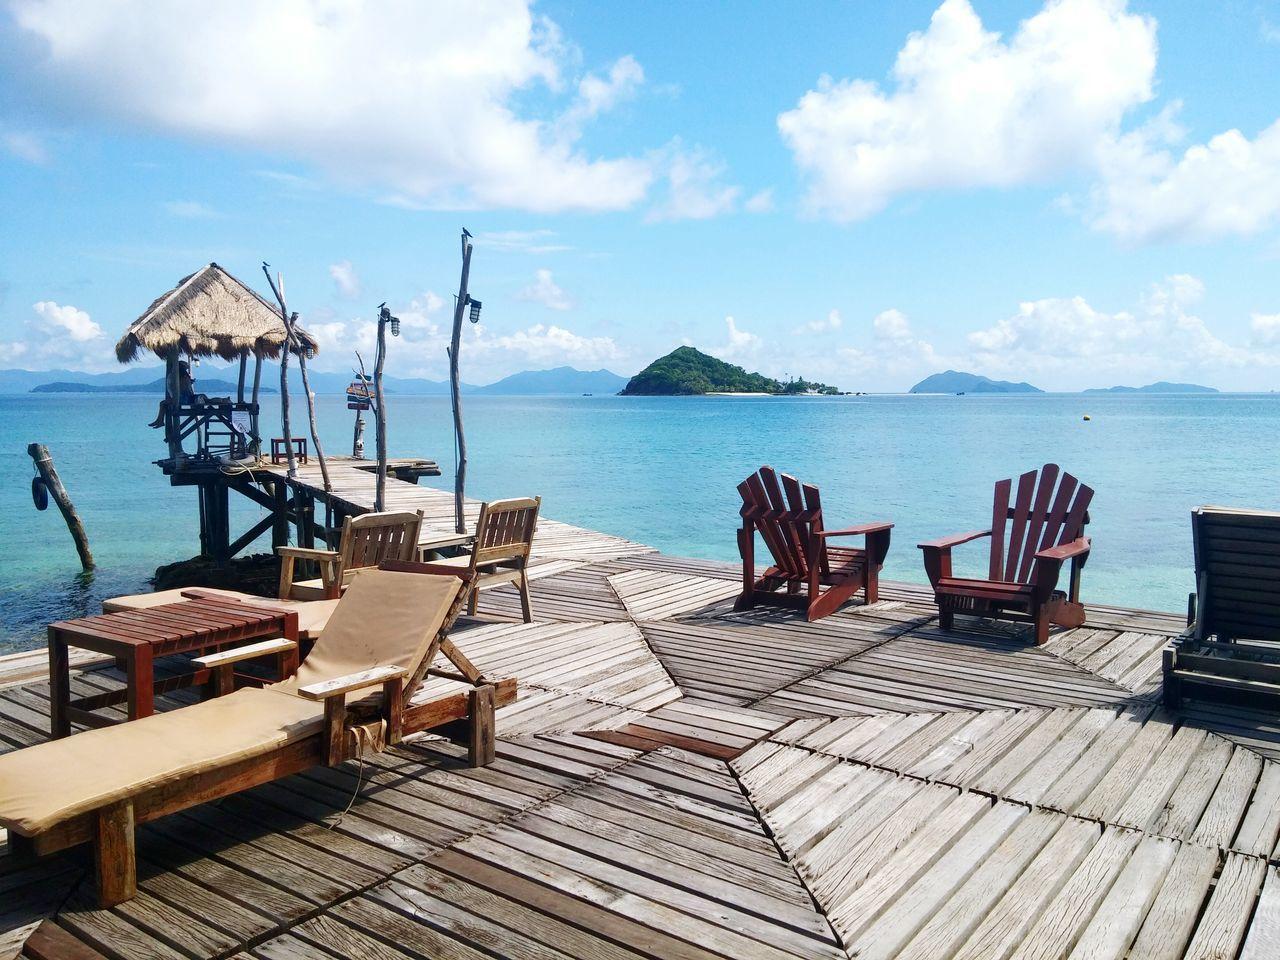 Beautiful stock photos of decks,  Beauty In Nature,  Blue,  Boardwalk,  Calm